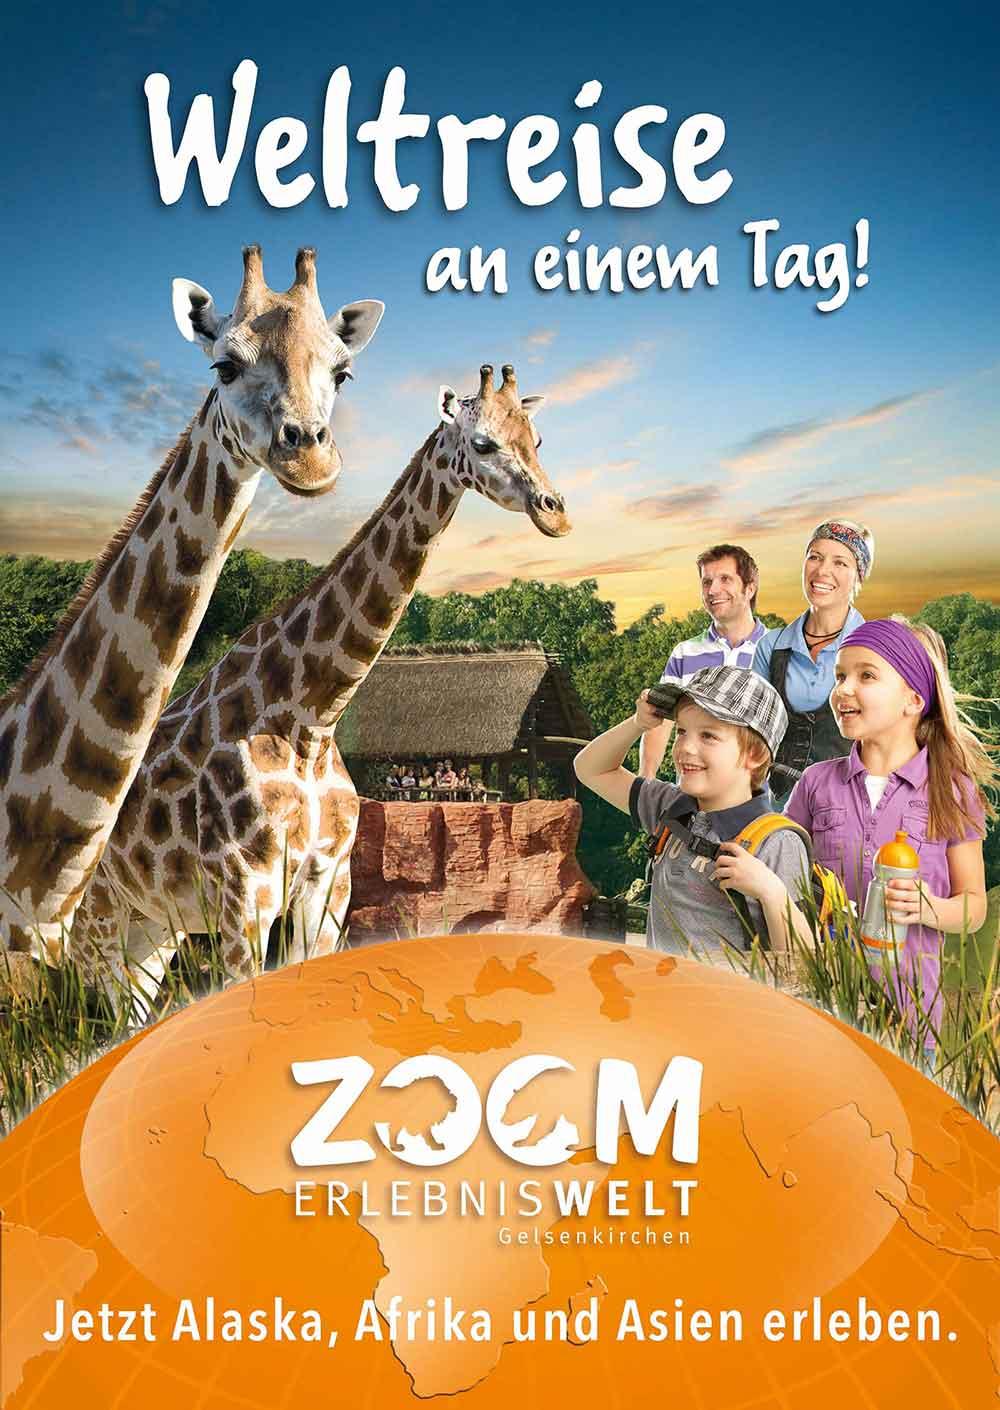 Werbekampagne für die ZOOM Erlebniswelt